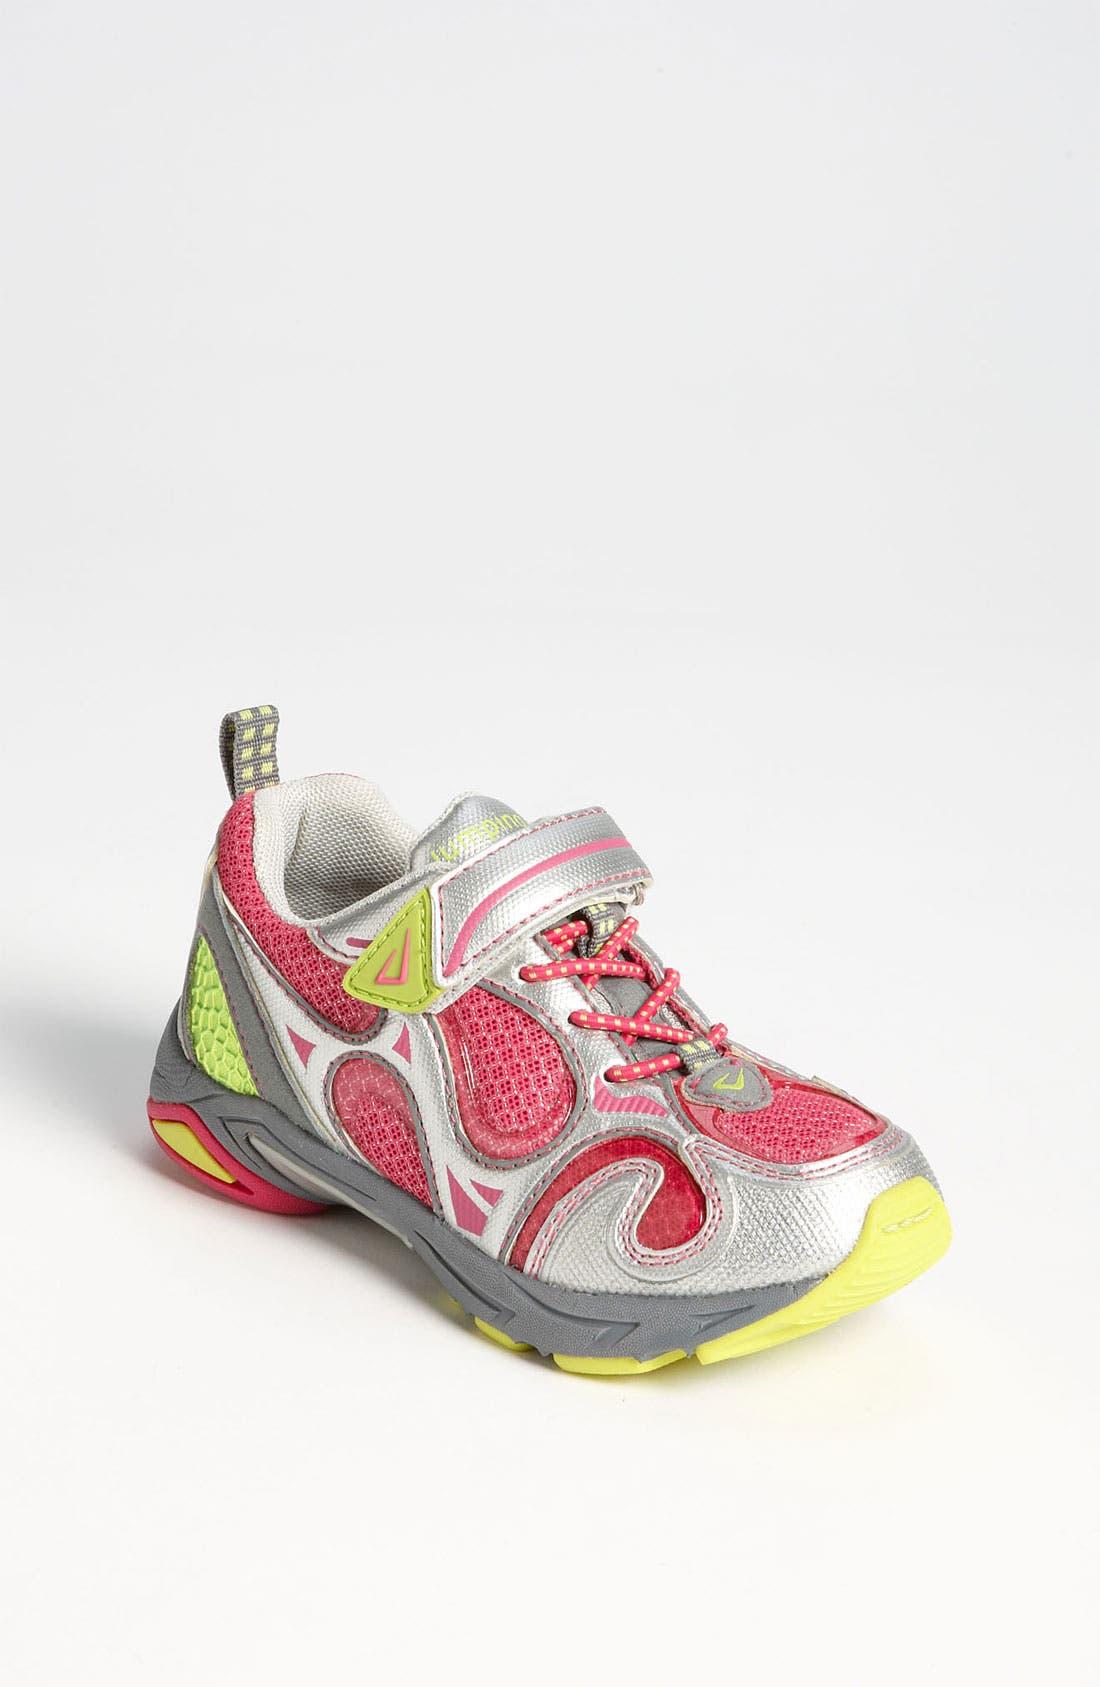 Alternate Image 1 Selected - Jumping Jacks 'Turtle Tuff' Sneaker (Toddler, Little Kid & Big Kid)